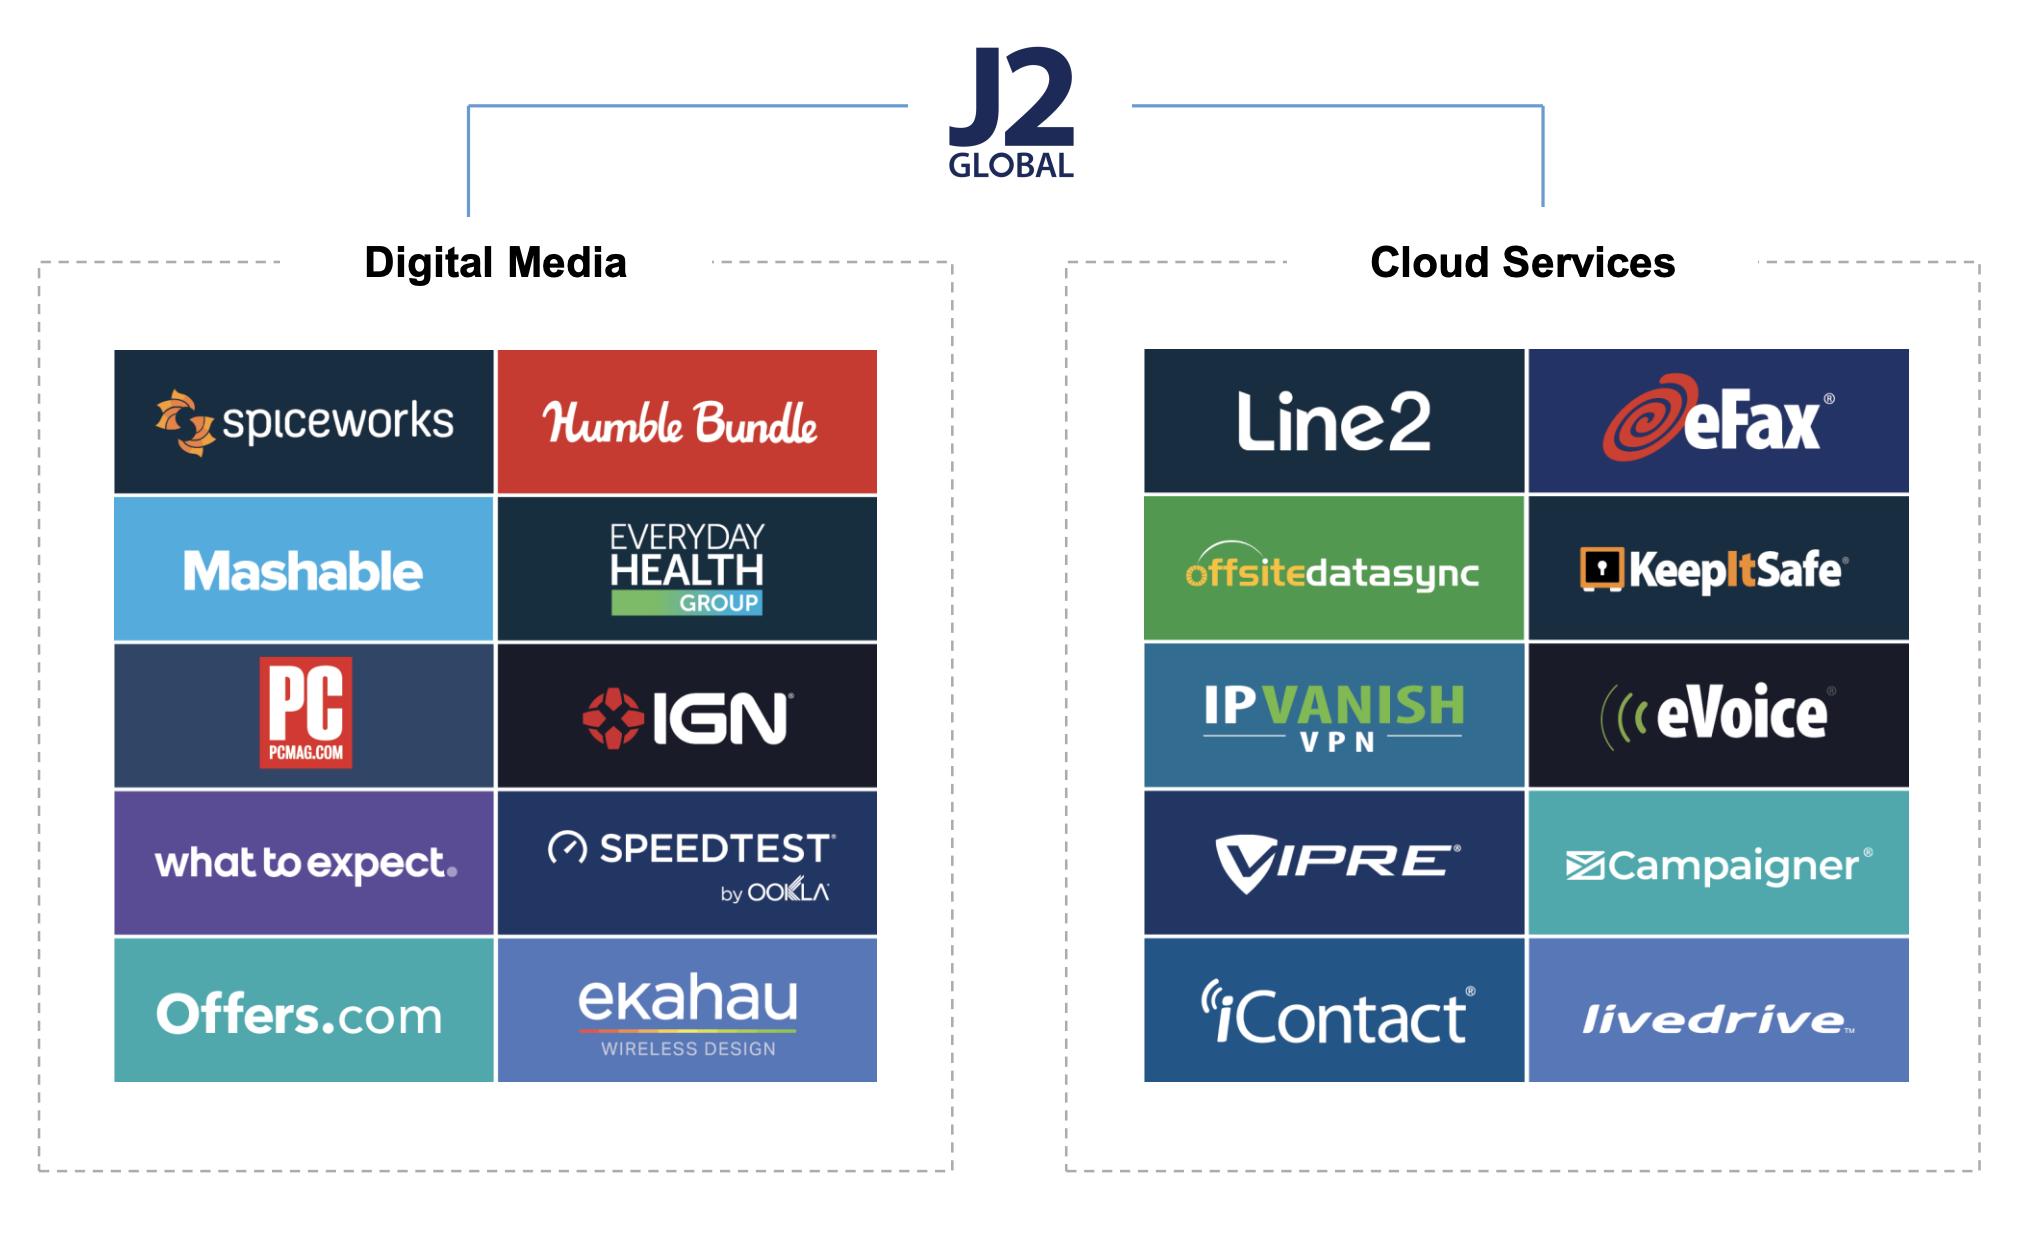 Бизнесы J2 Global. Слева — цифровые медиа. Справа — облачные услуги. Источник: презентация компании, слайд 18